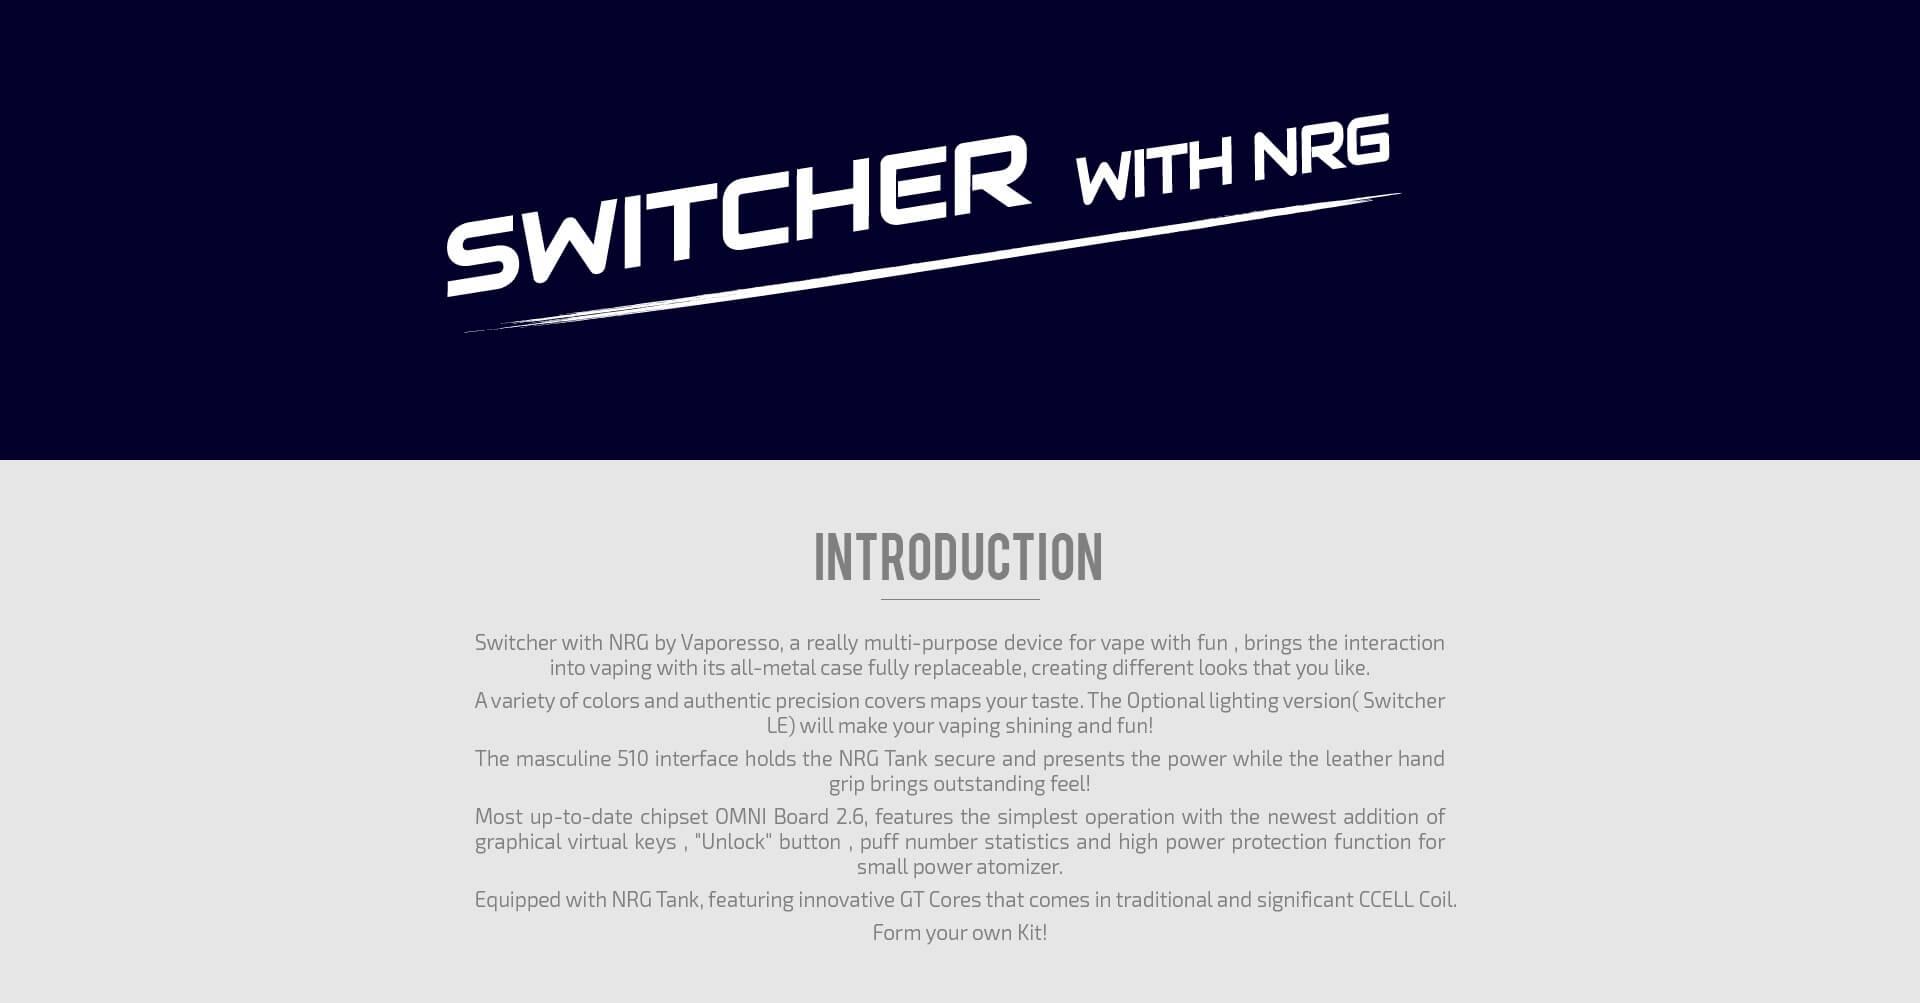 switcher_with_nrg_2.jpg